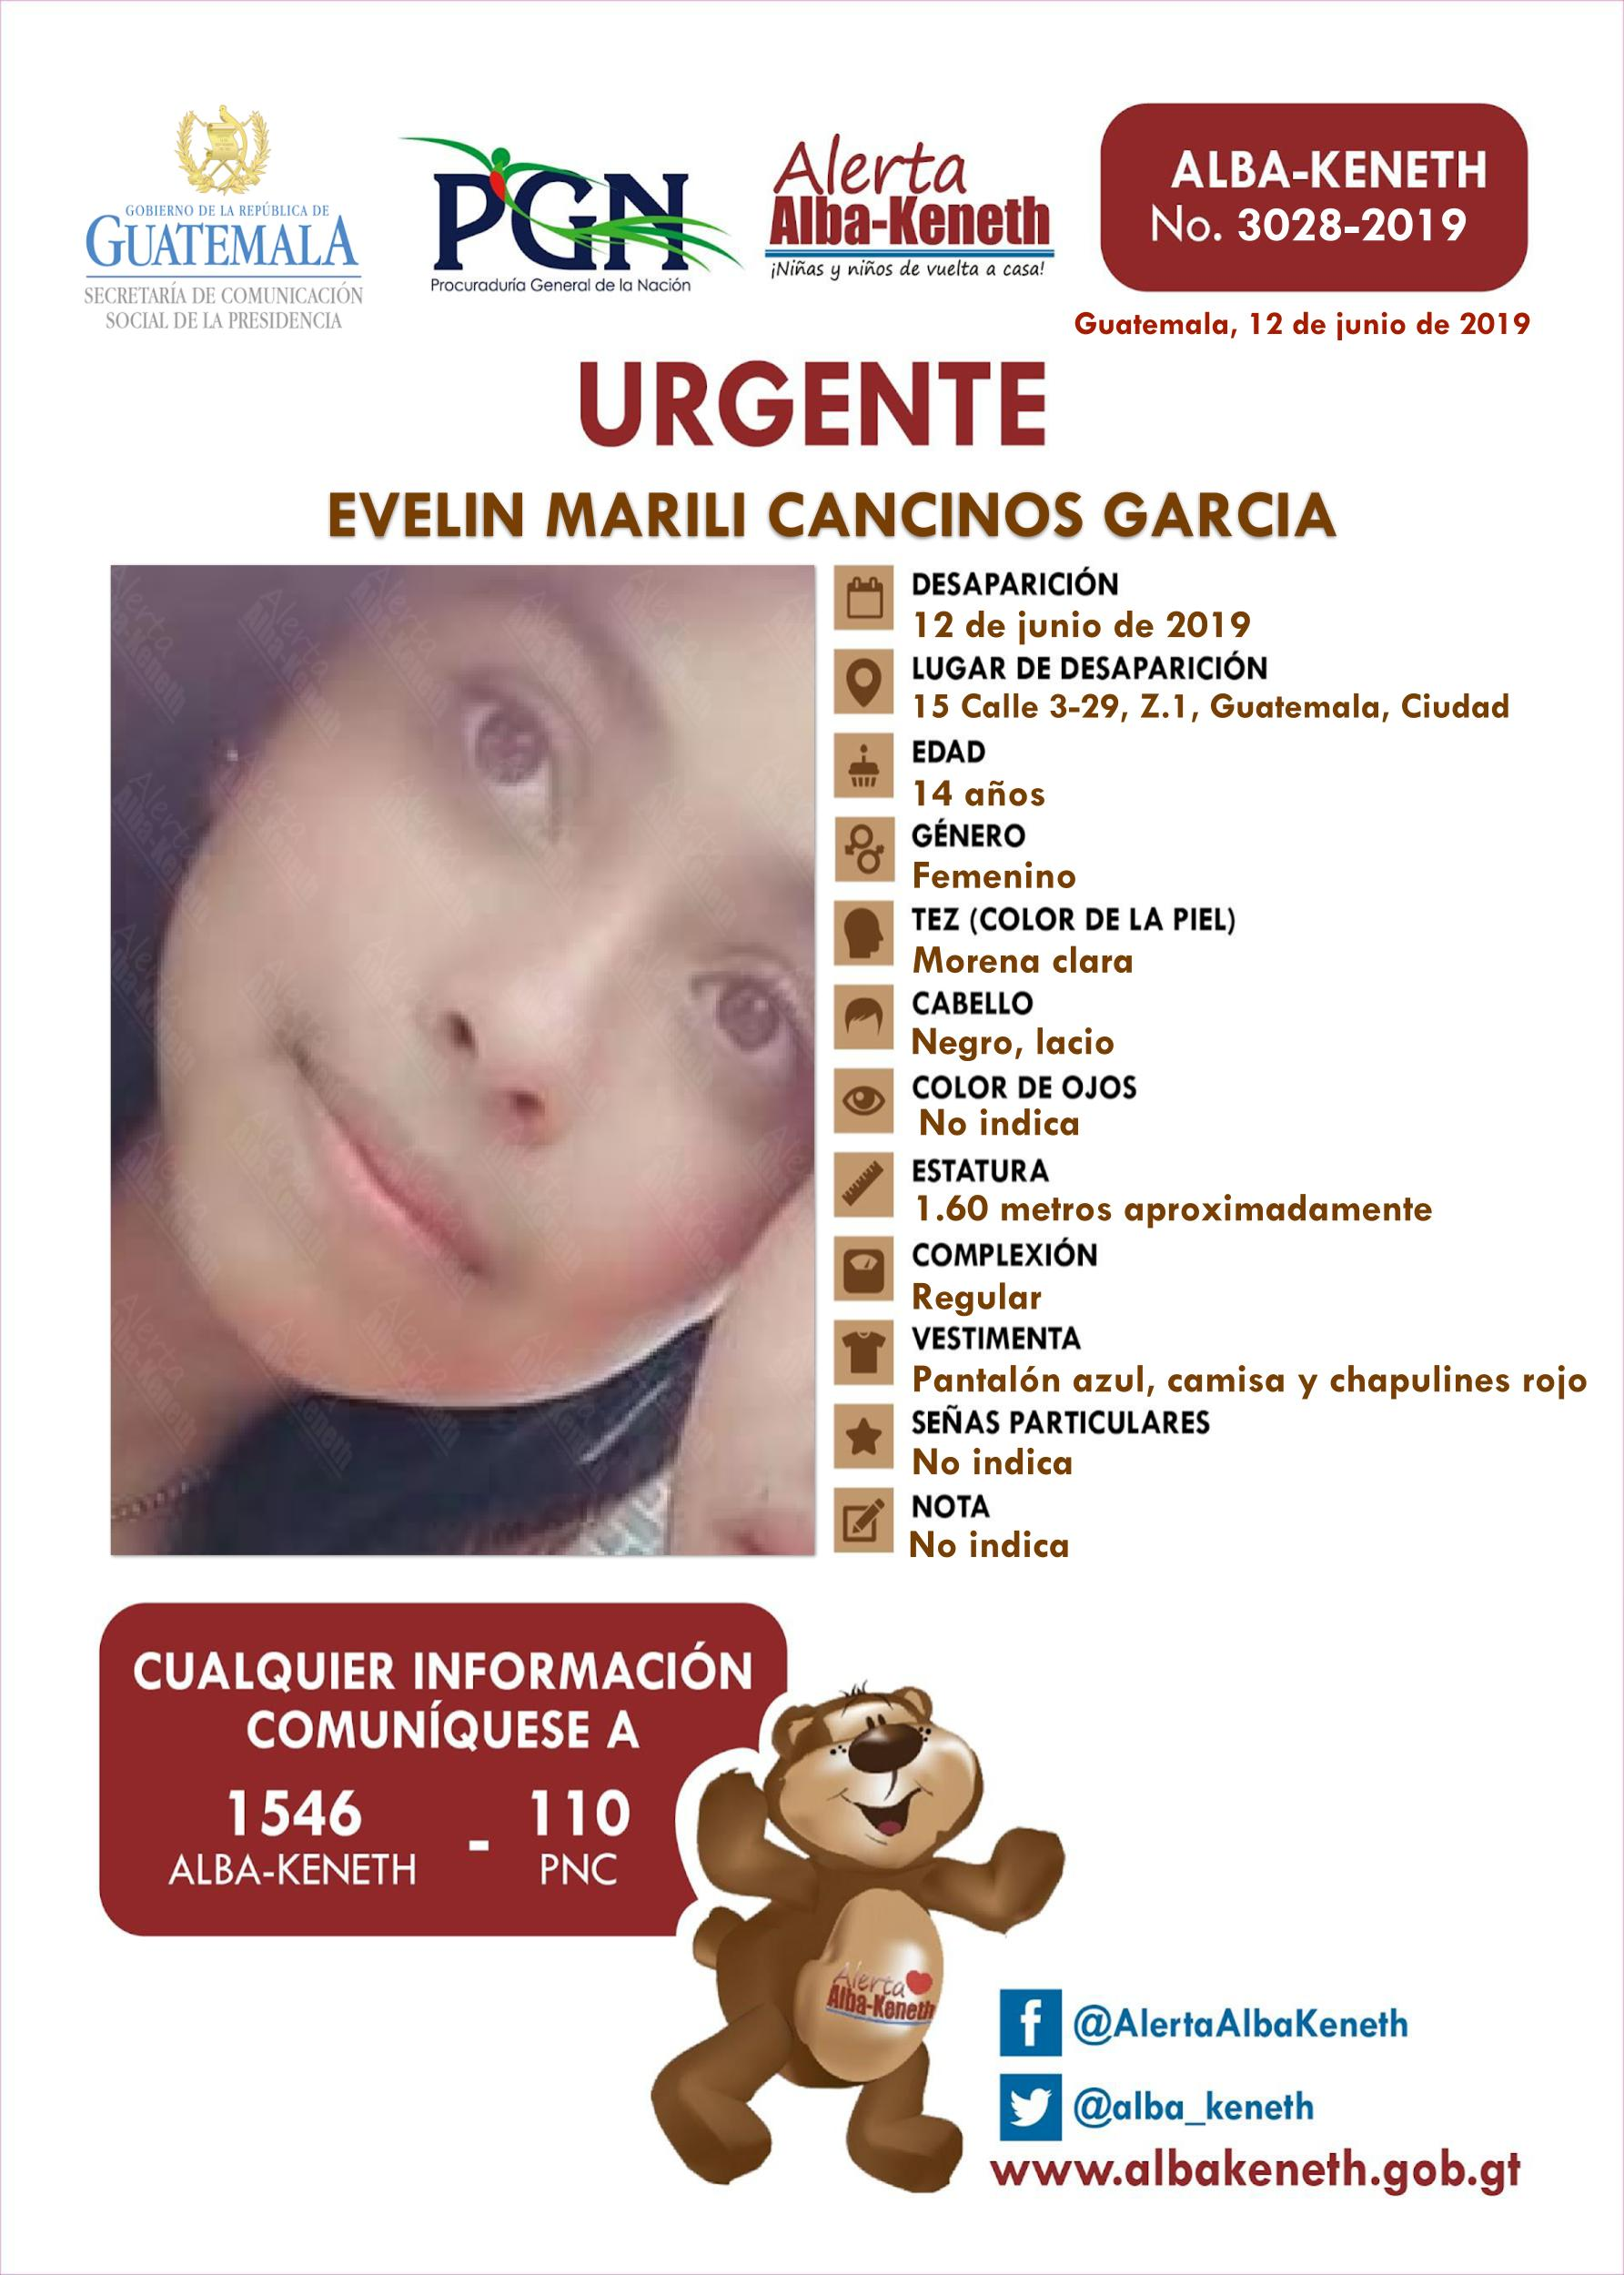 Evelin Marili Cancinos Garcia